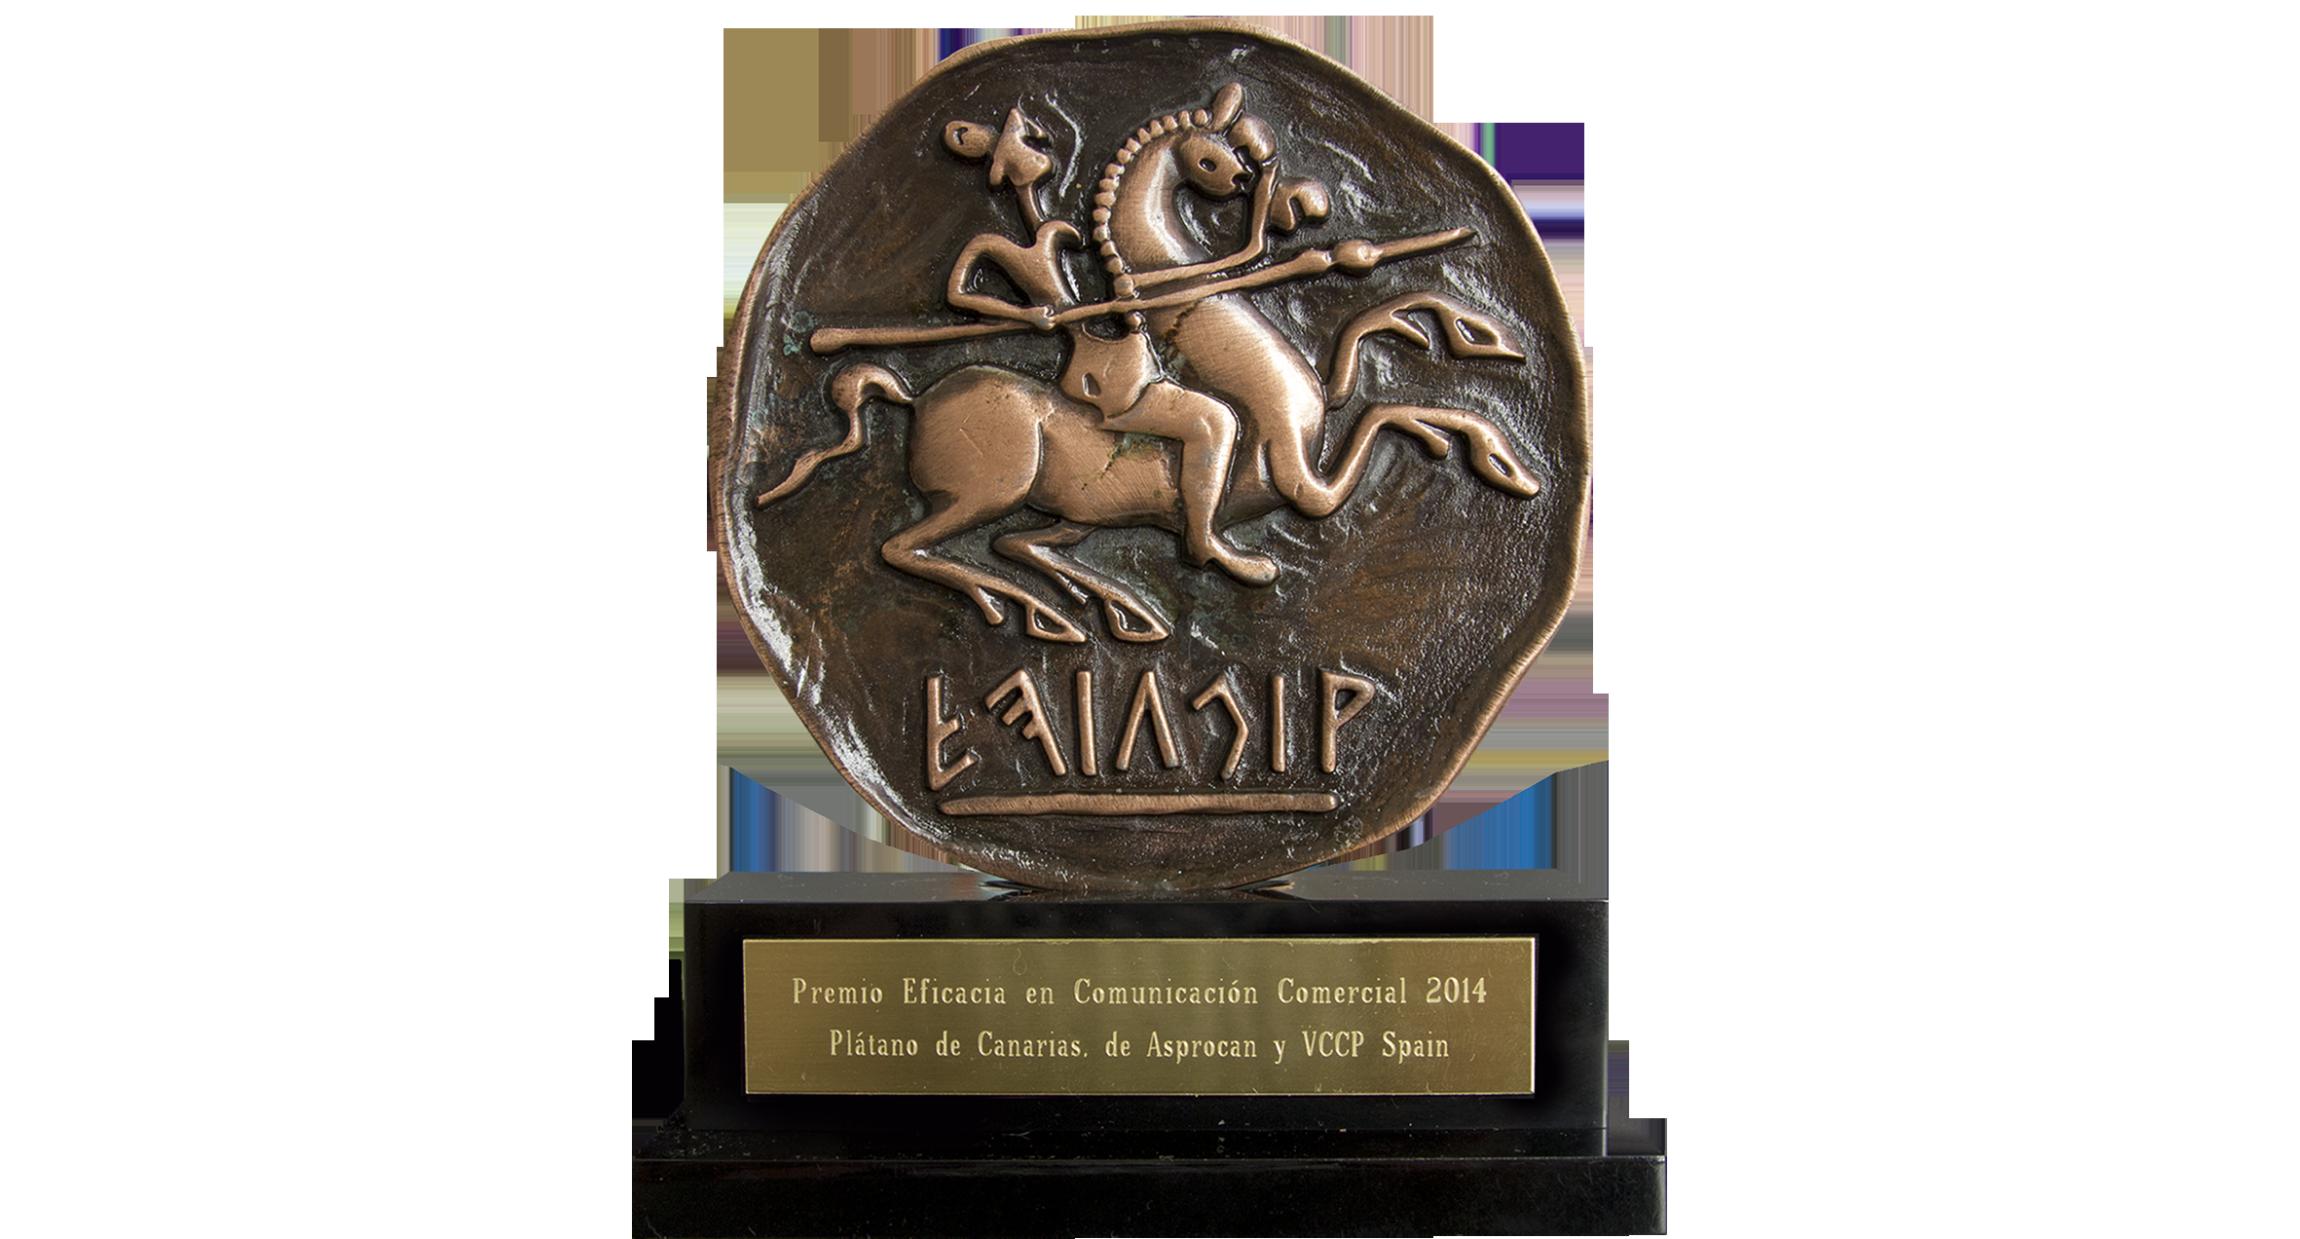 Premio Eficacia apaisado PDC